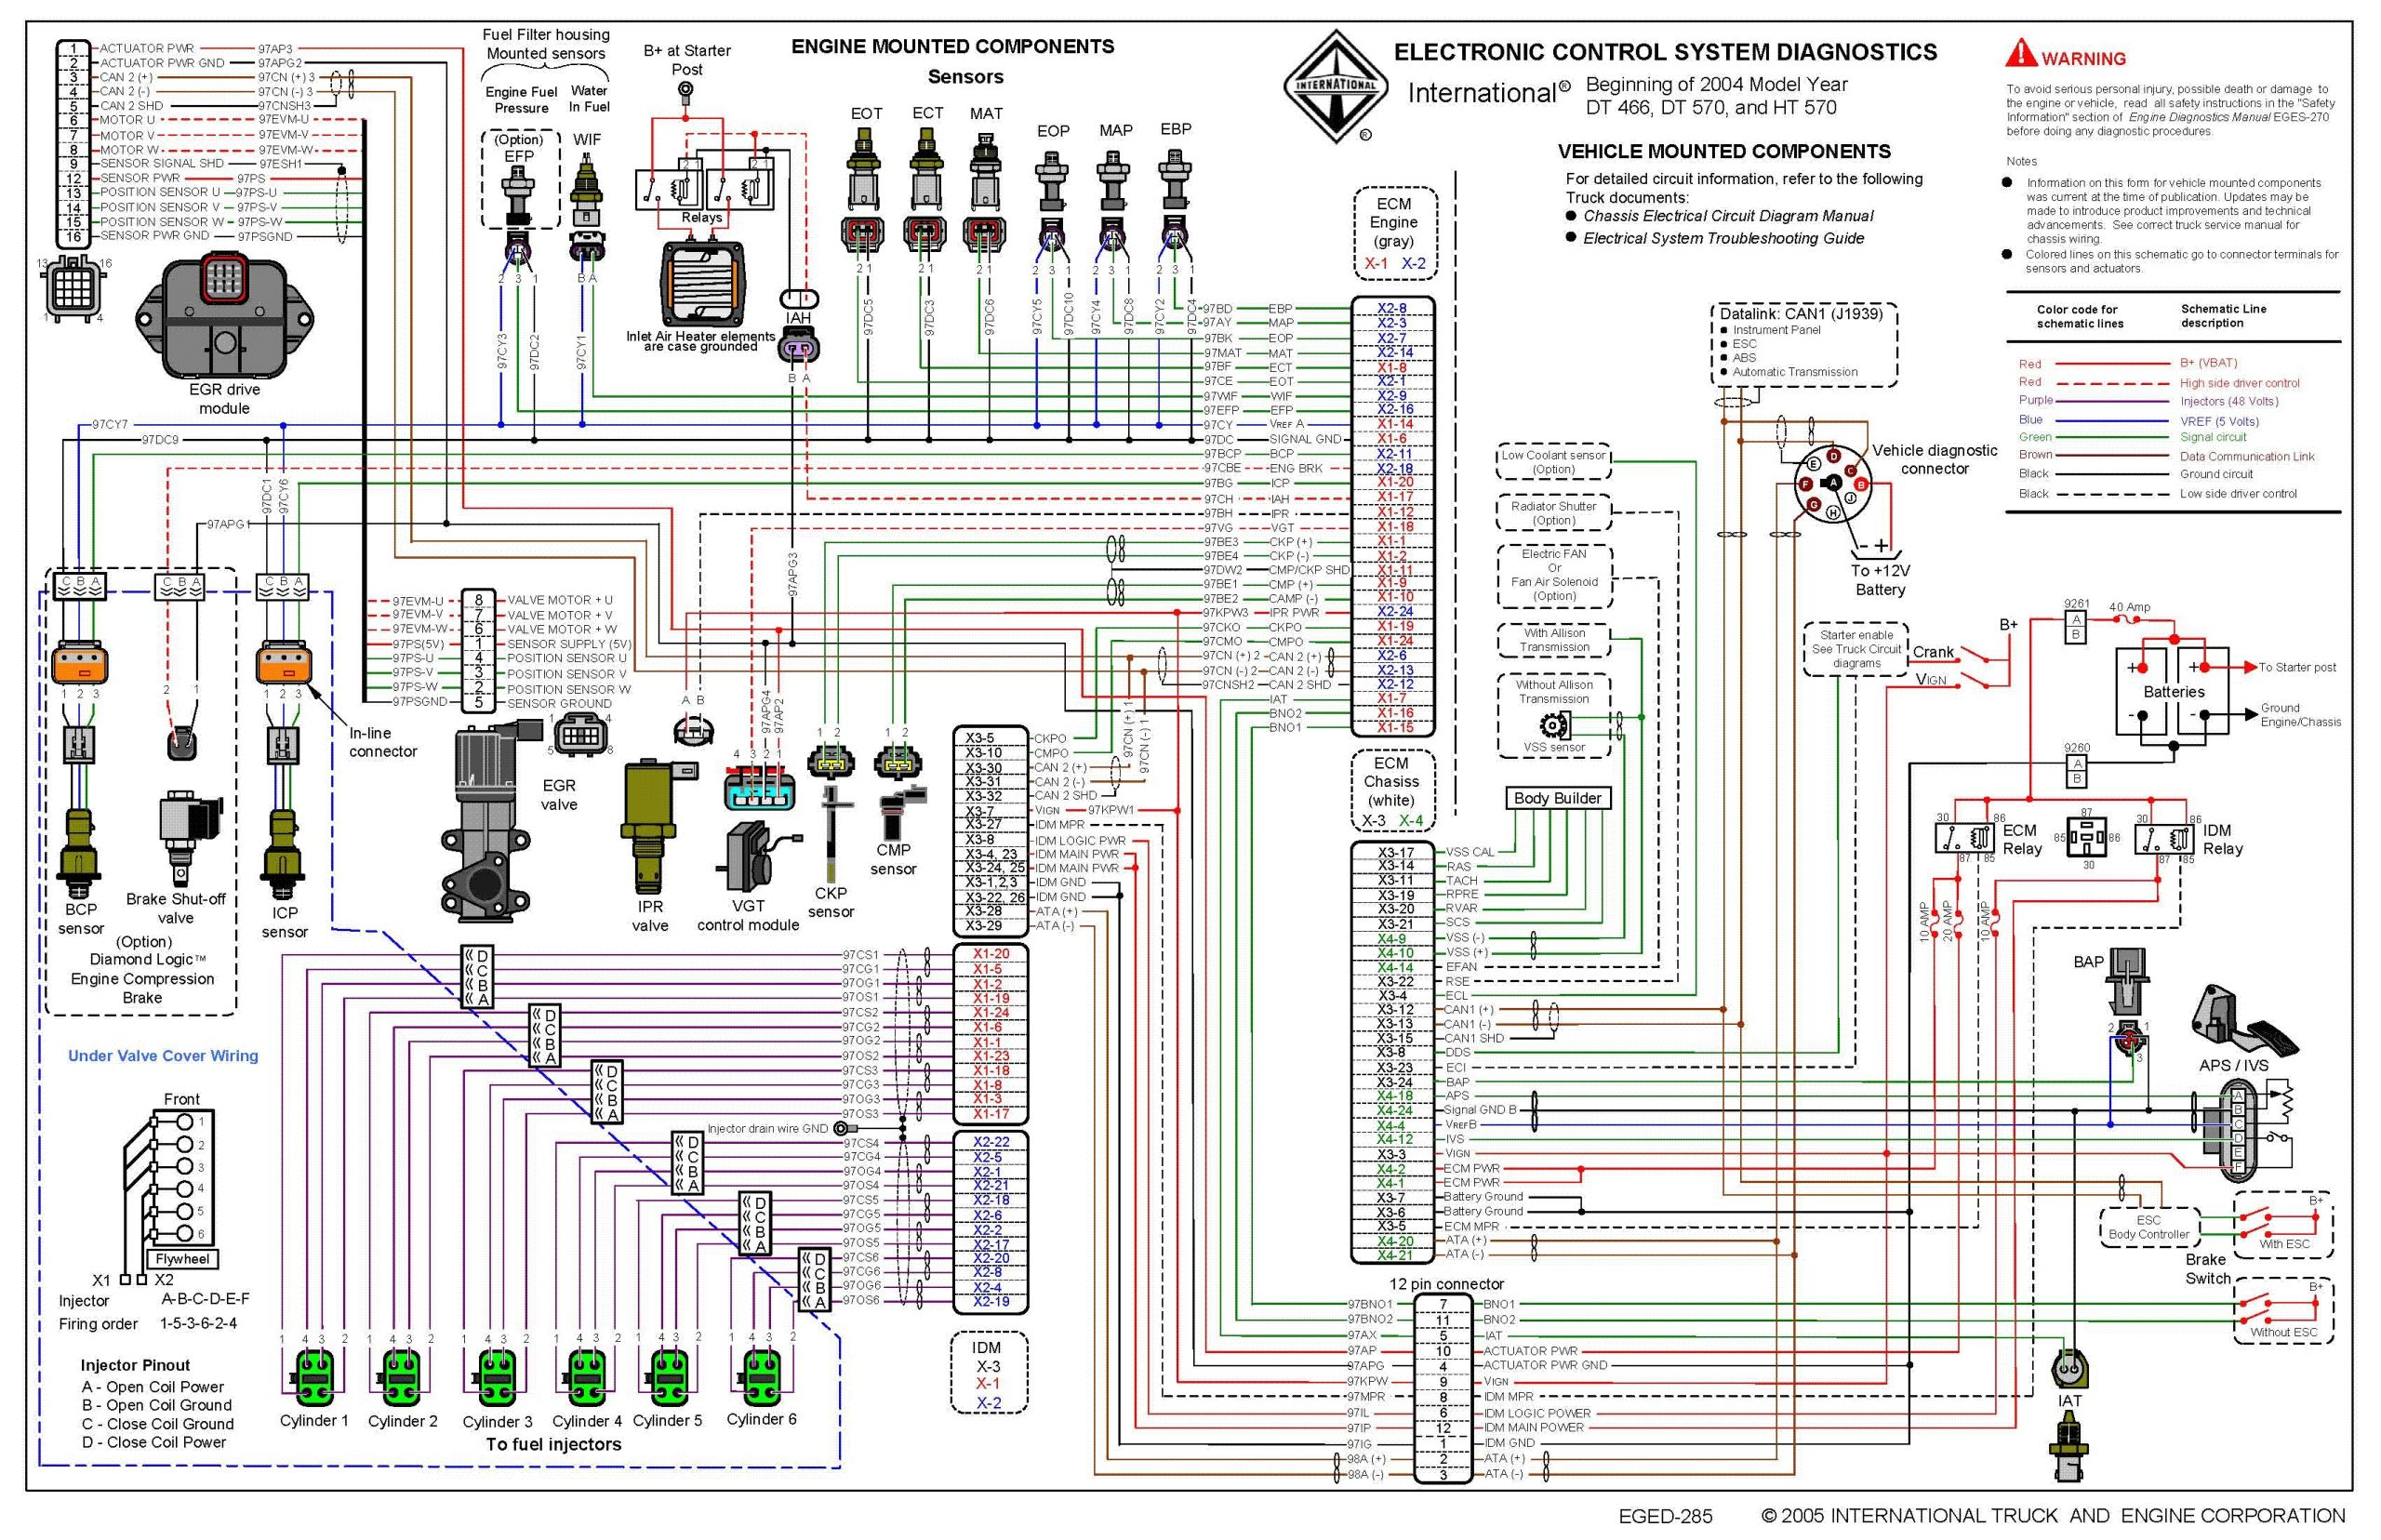 international dt466 engine diagram 4700 wiring diagram as well 2006 international 4300 wiring diagram of international dt466 engine diagram jpg